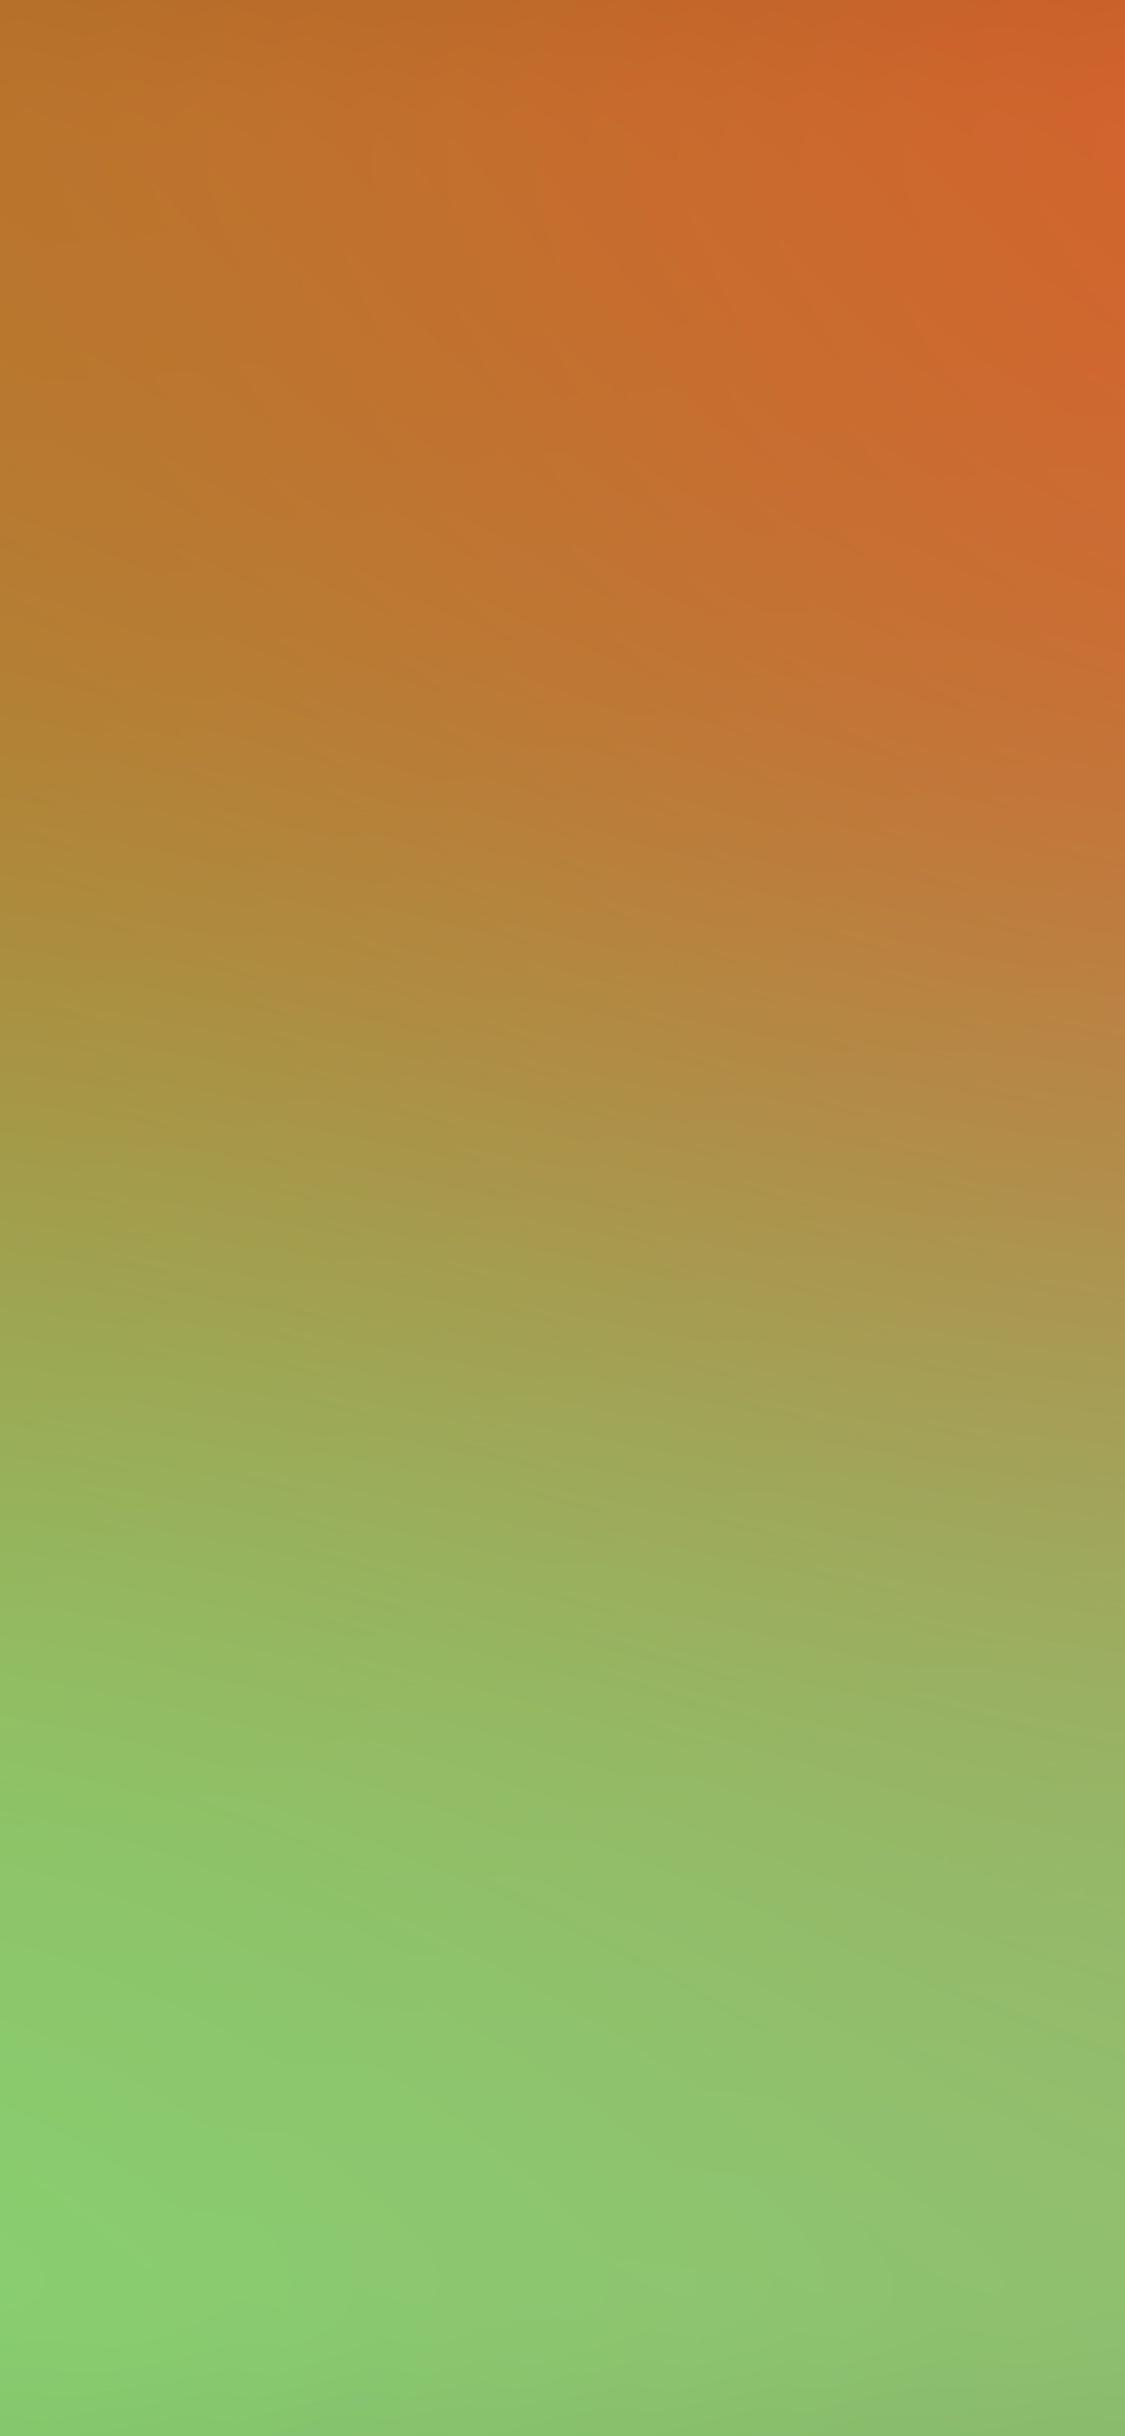 Fantastic Wallpaper Logo Green Day - papers  Snapshot_479285.jpg